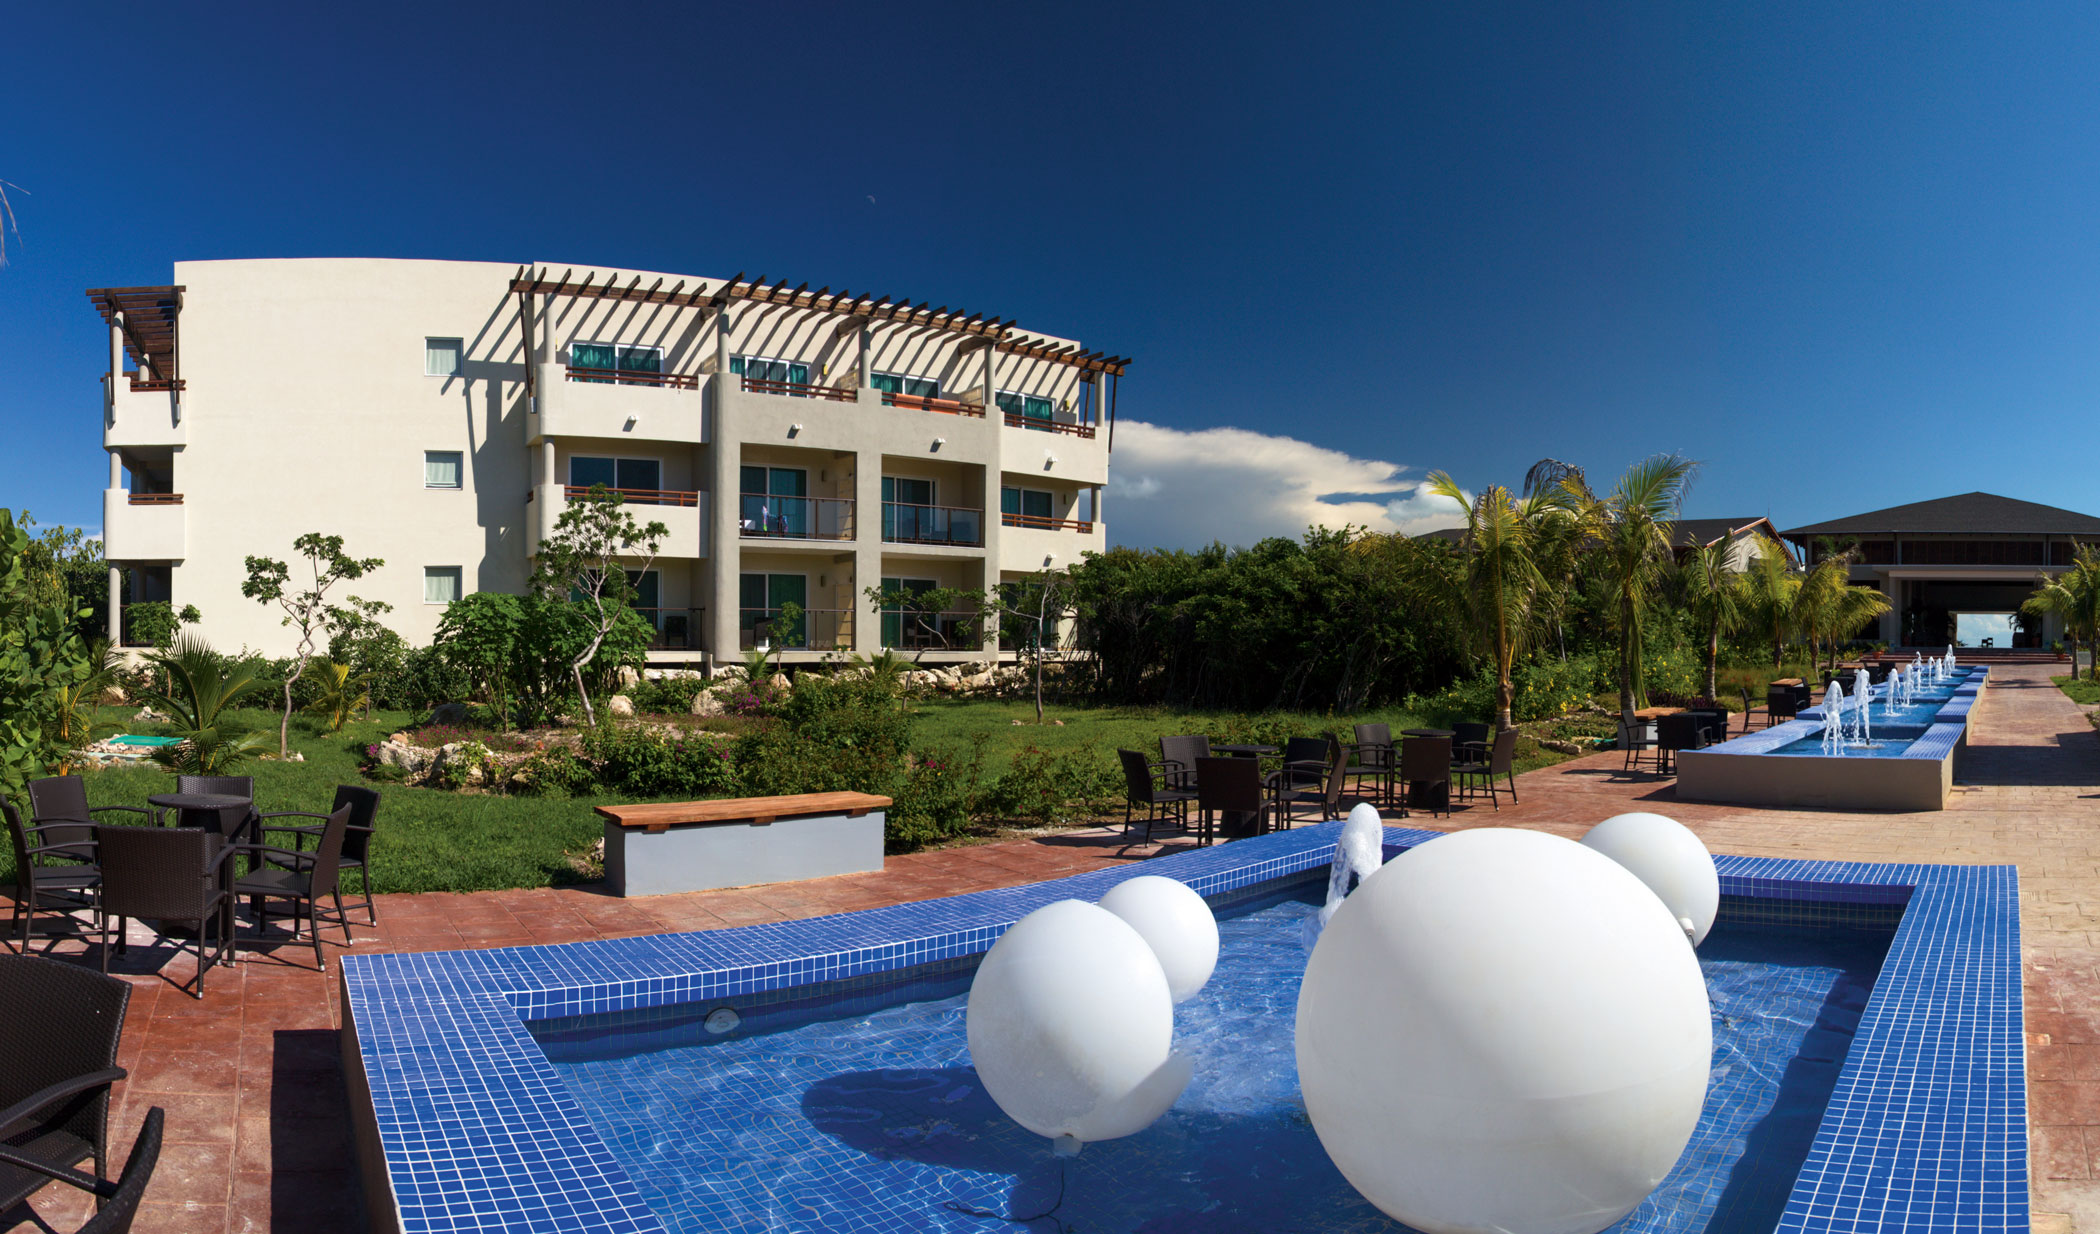 Golden Tulip Aguas Claras Resort Cayo Santa Maria Transat